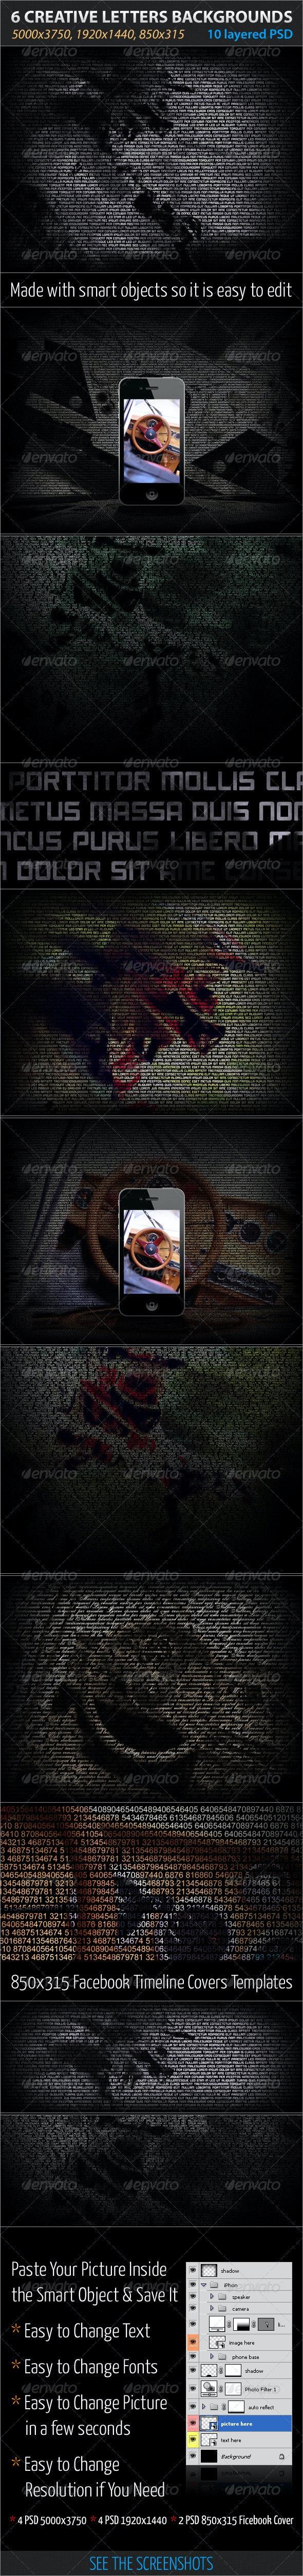 6 Creative Letters Backgrounds - Tech / Futuristic Photo Templates